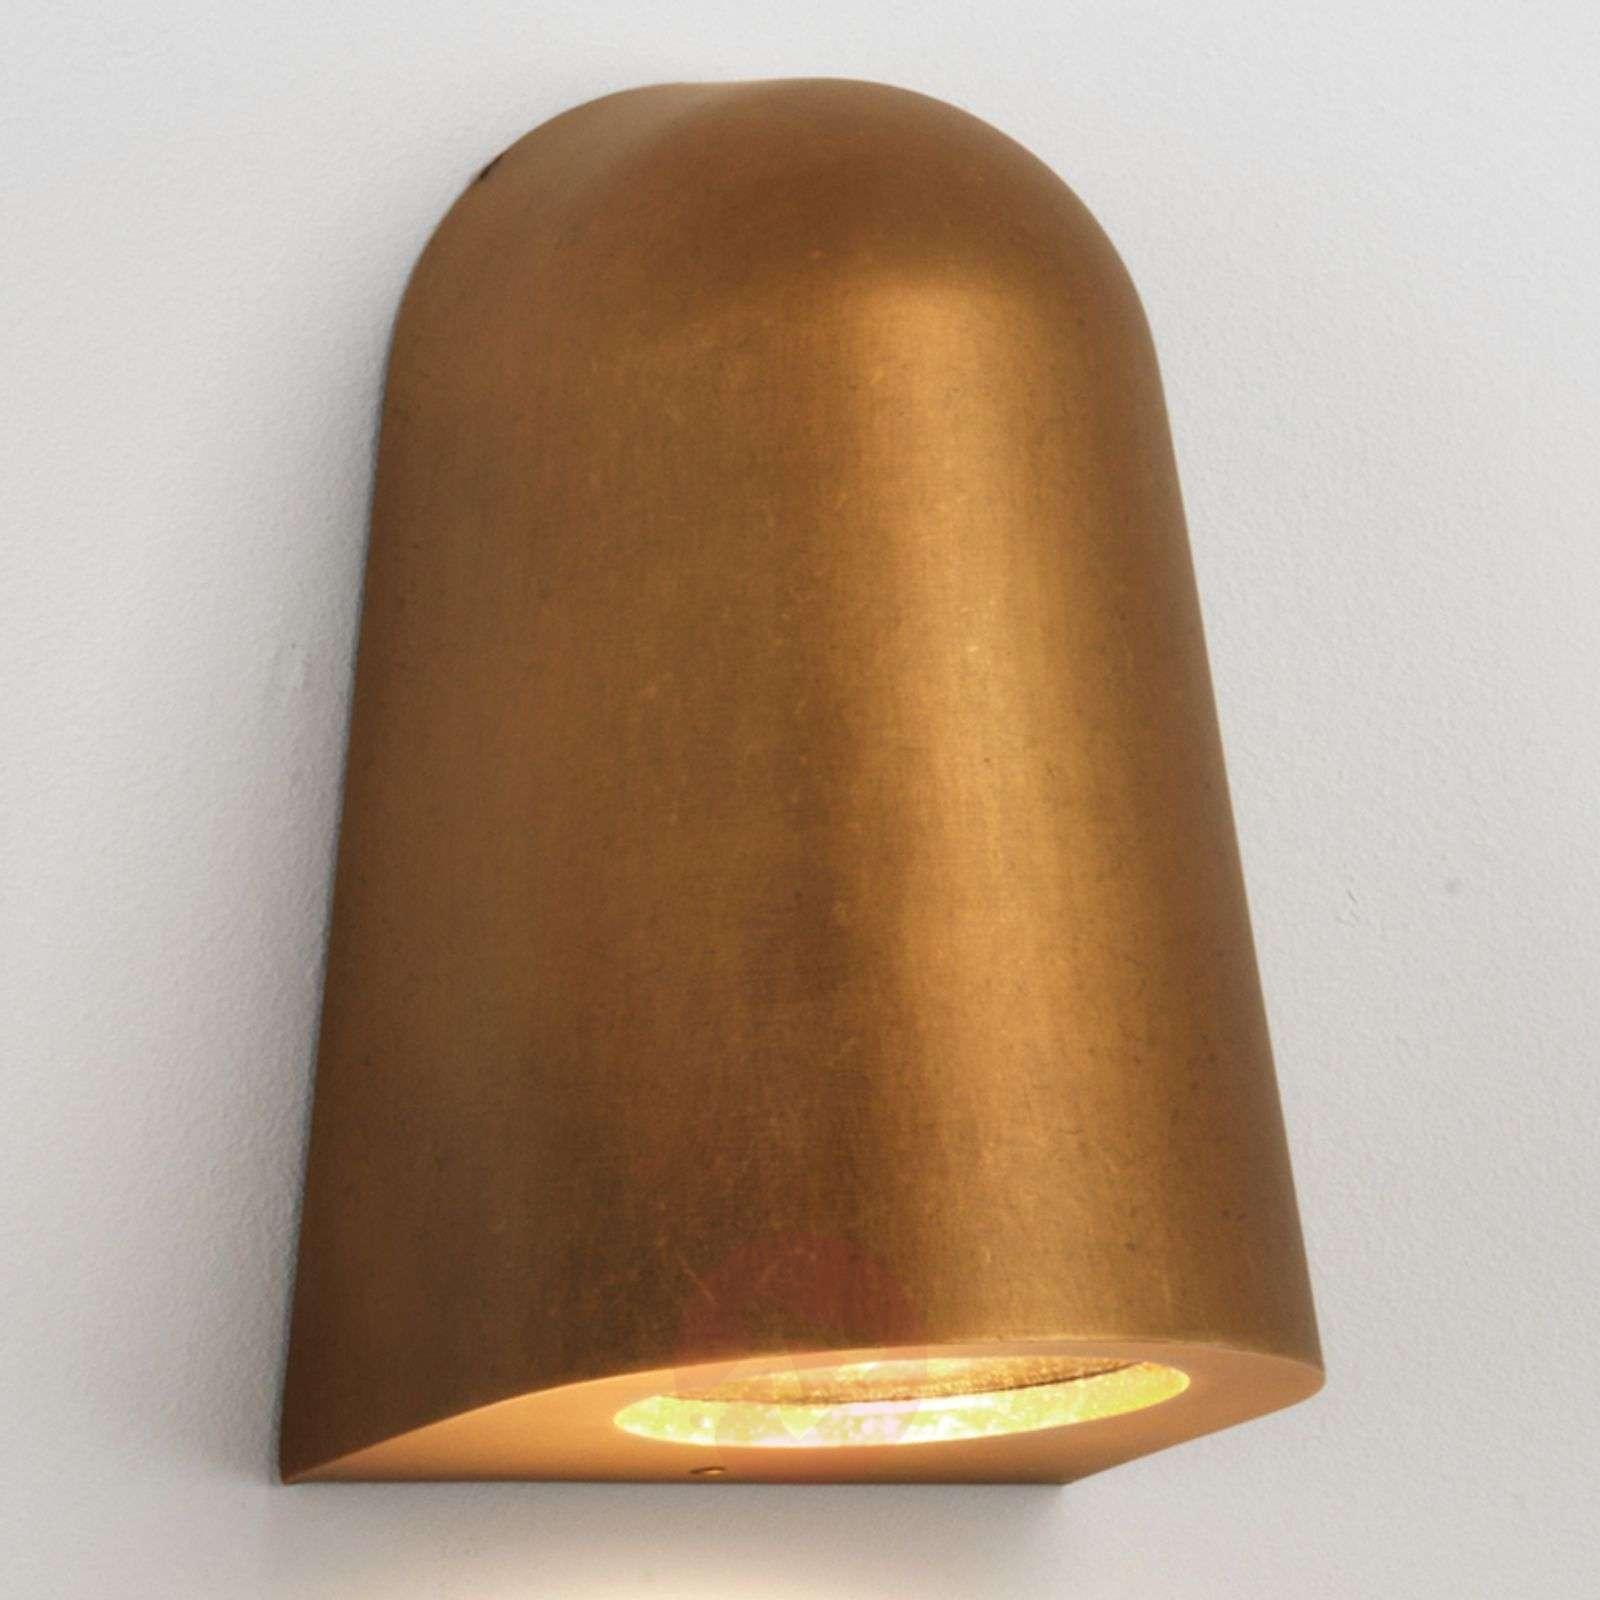 Seawater-resistant outdoor wall light Mast Light-1020563-01